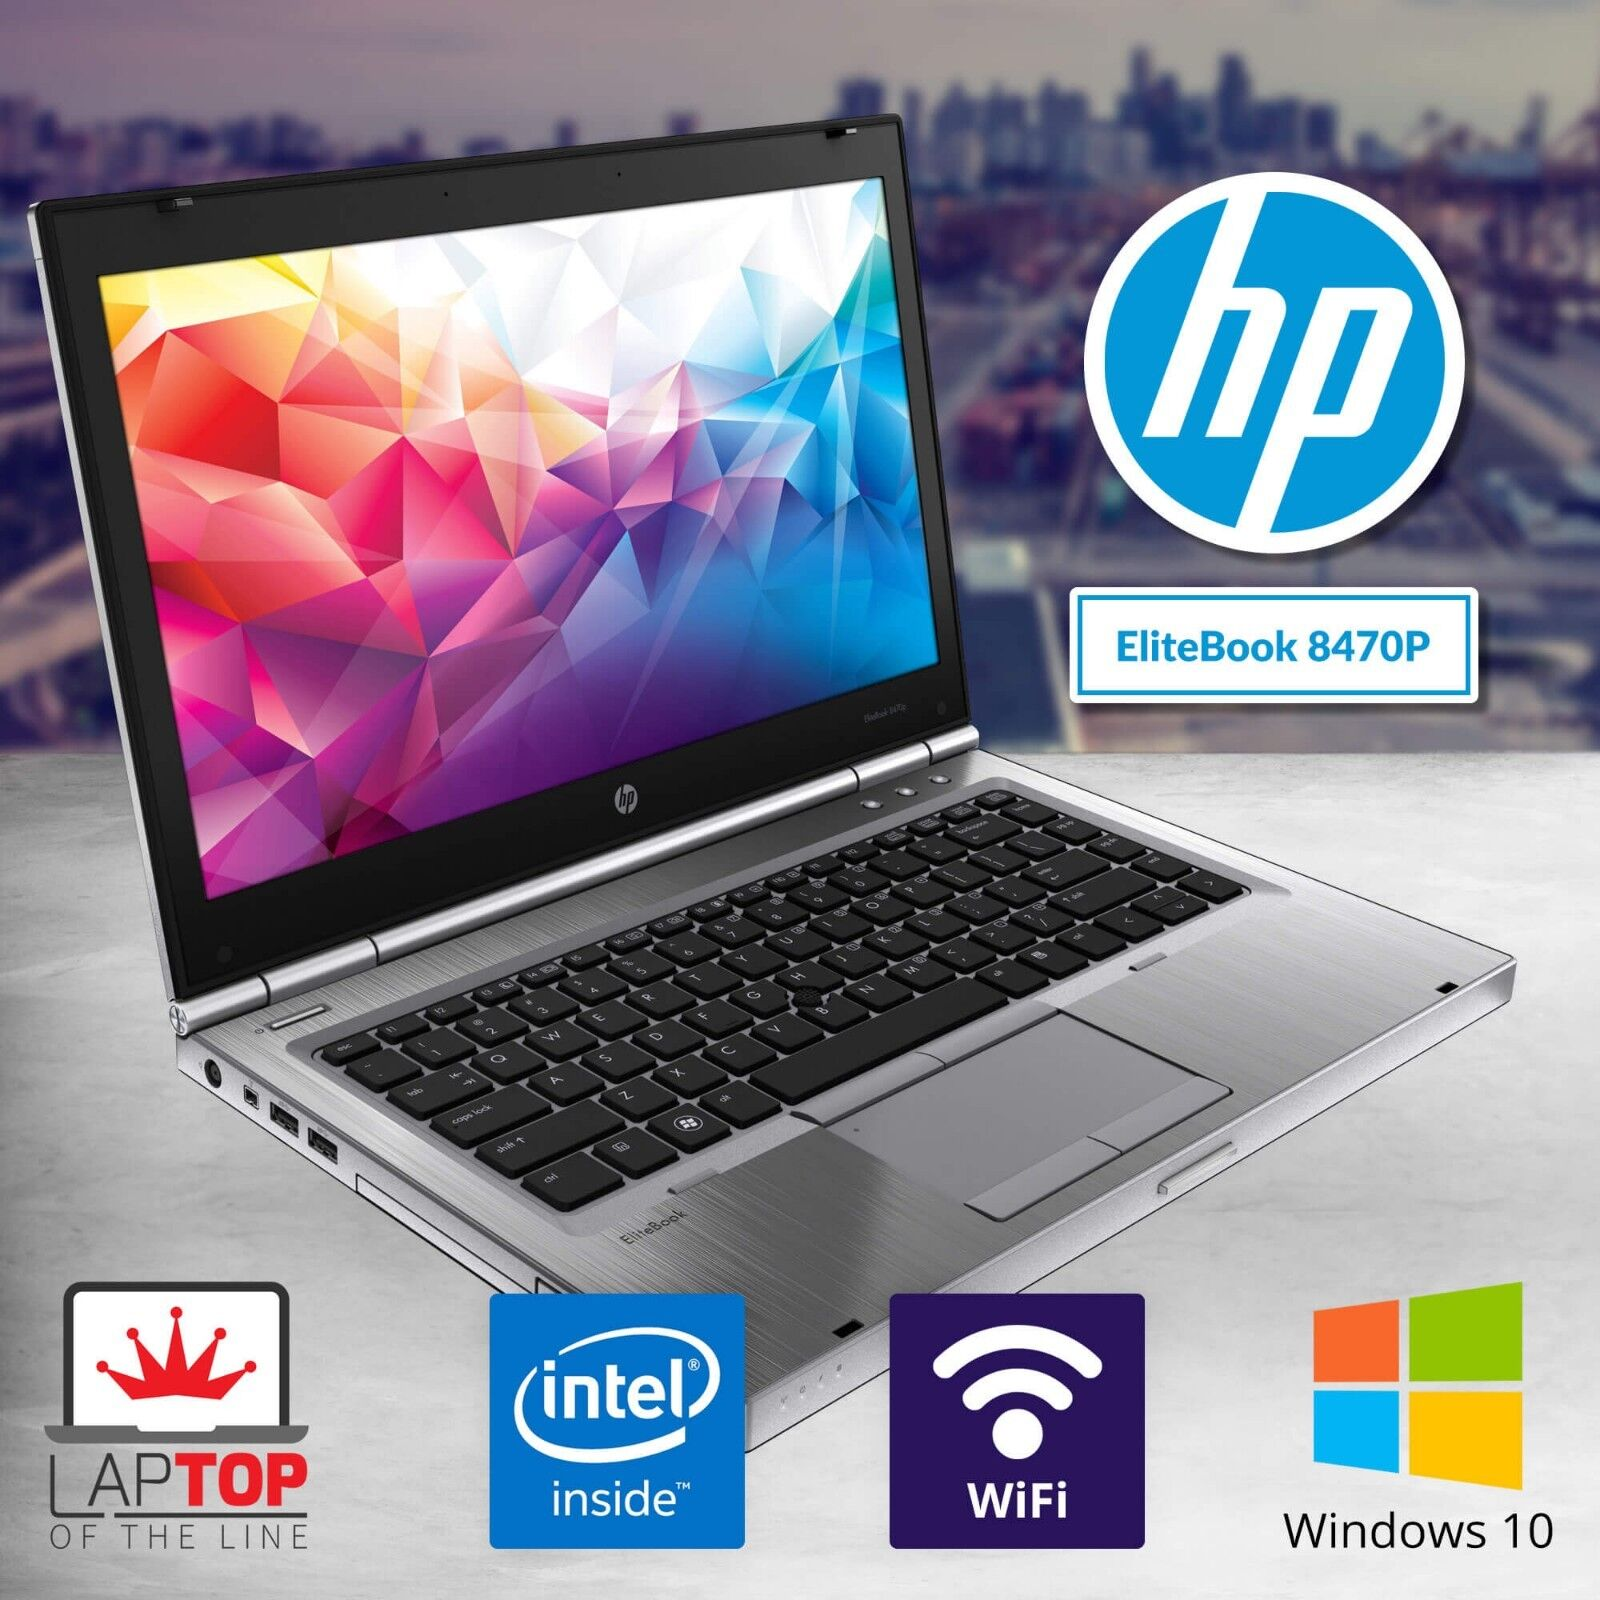 Laptop Windows - Fast HP Laptop Computer Intel i5 8GB RAM 500GB HD Windows 10 Pro PC WiFi Webcam